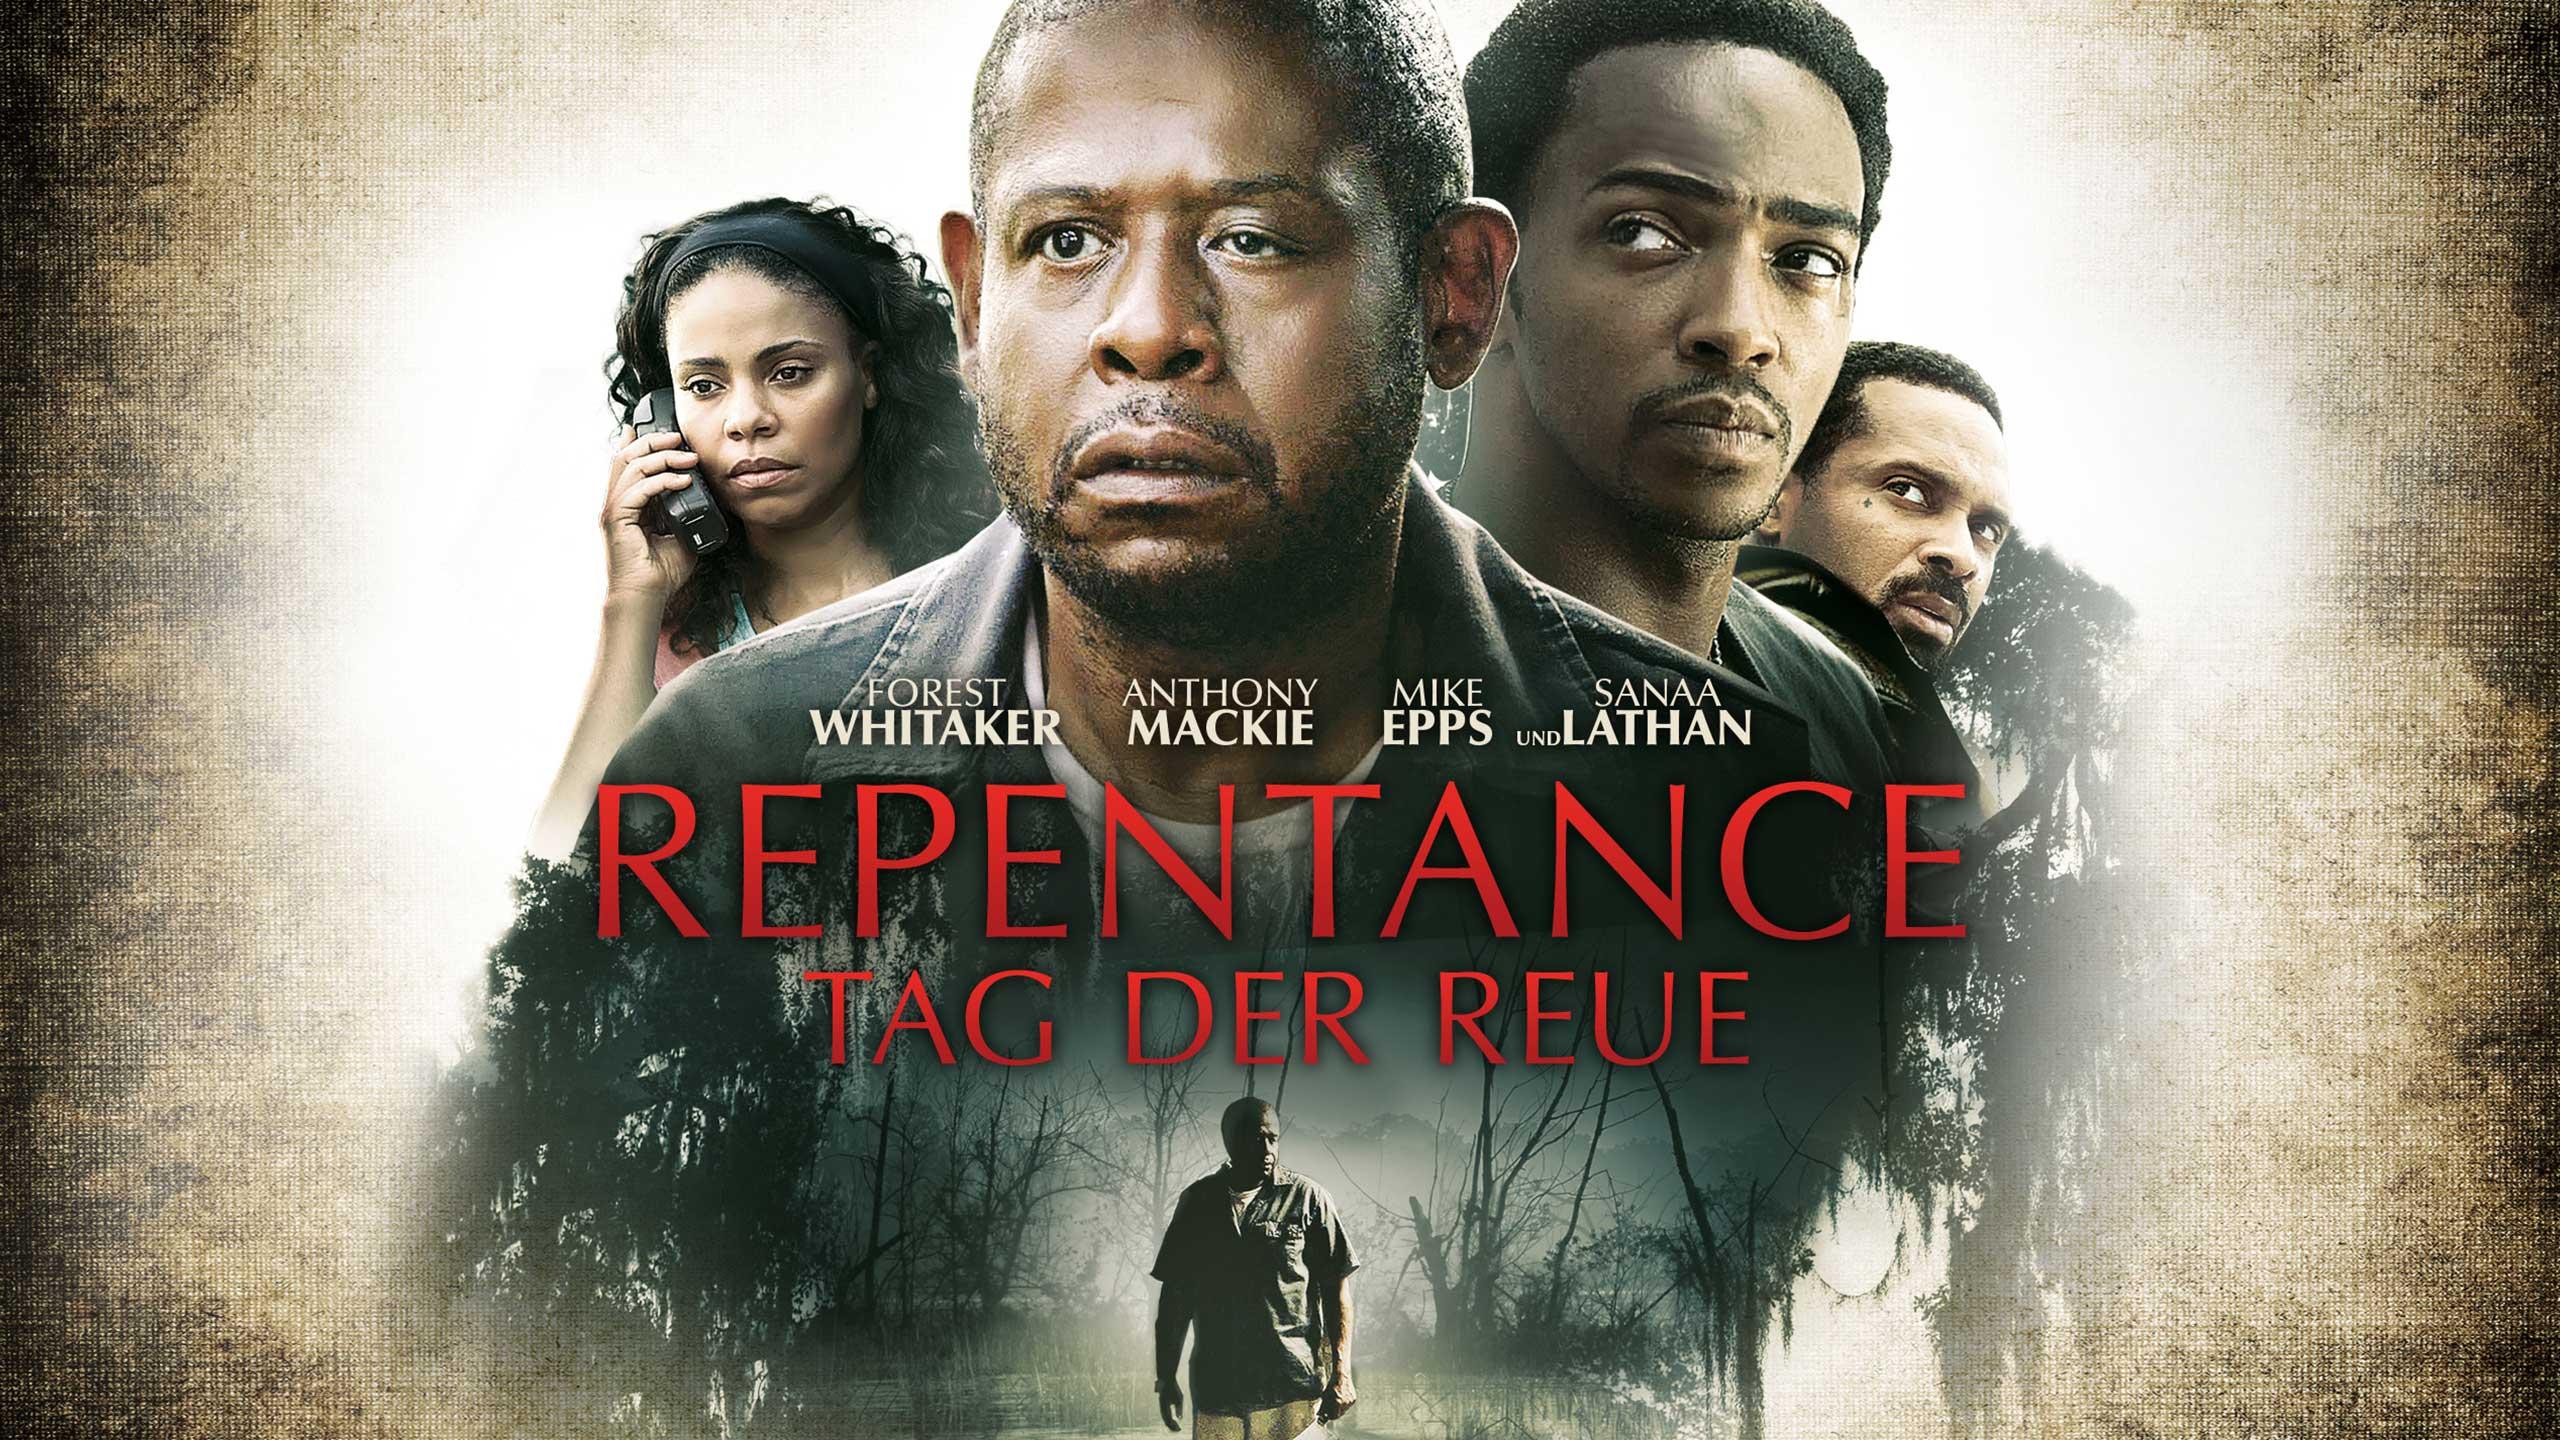 repentance-tag-der-reue\header.jpg